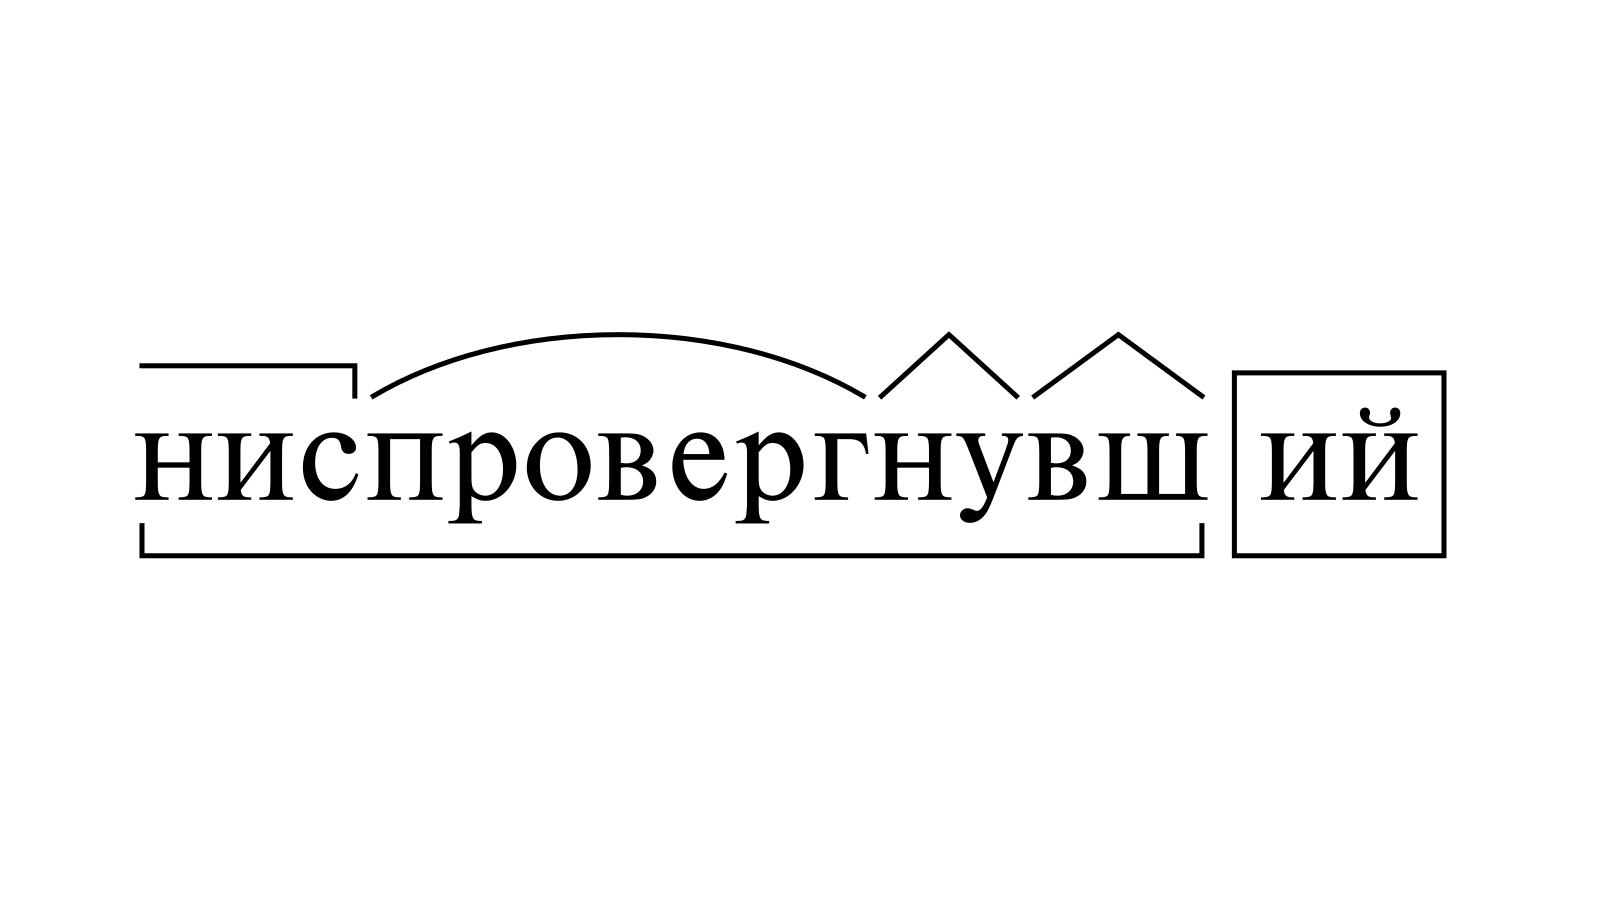 Разбор слова «ниспровергнувший» по составу